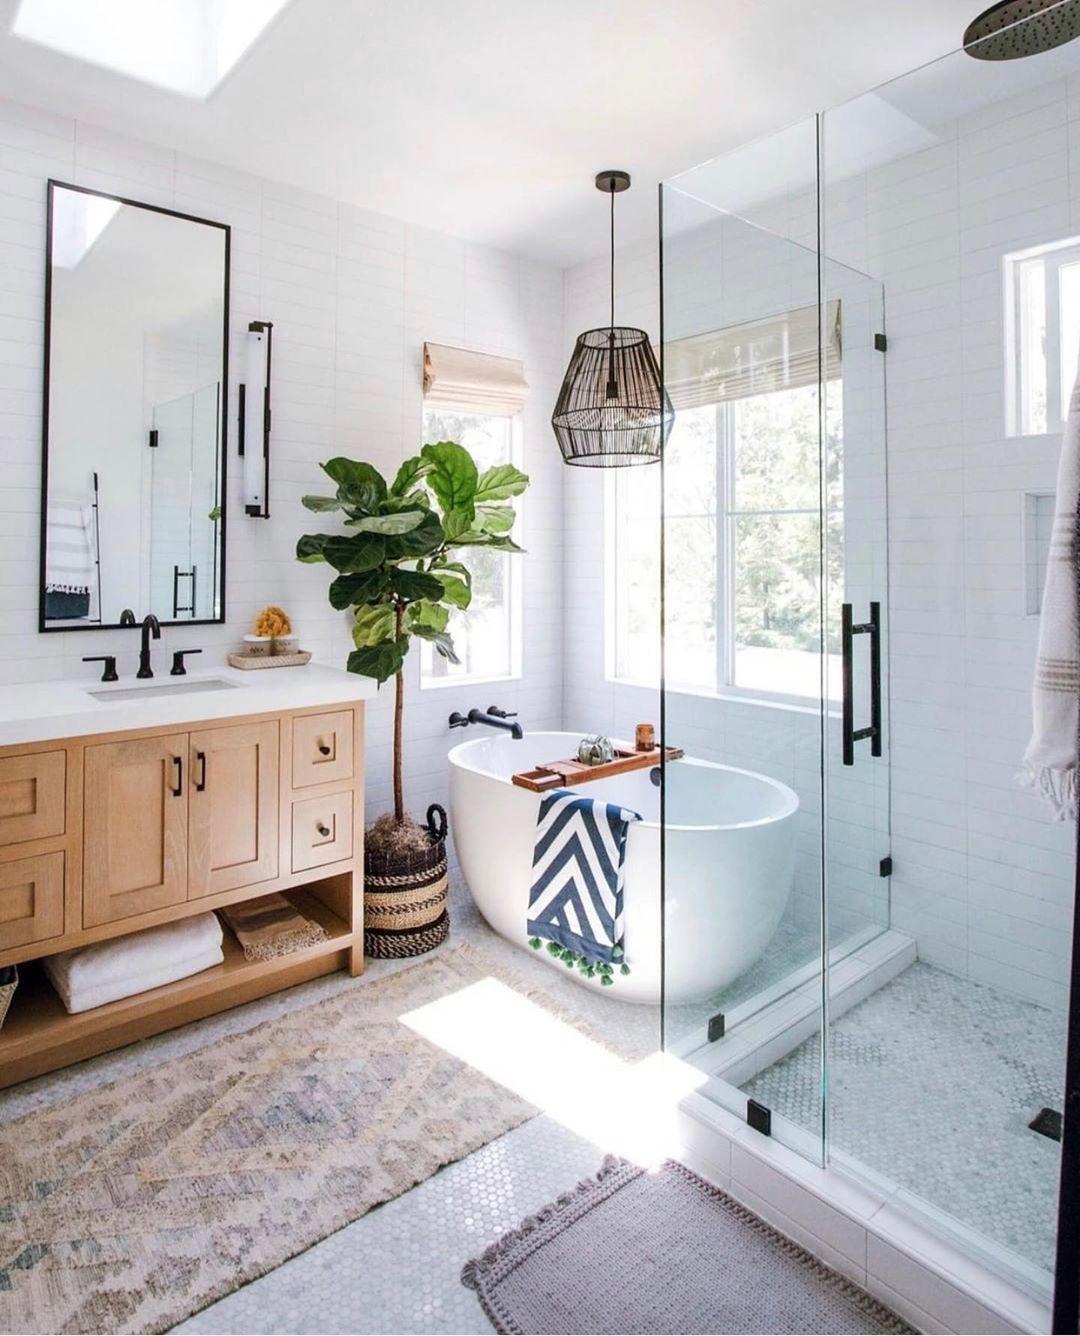 Sandi Shalia On Instagram This Is My Dream Bathroom And It Belongs Our Friend Anitayokota We Had The Privile Bathroom Interior Design House Bathroom Home